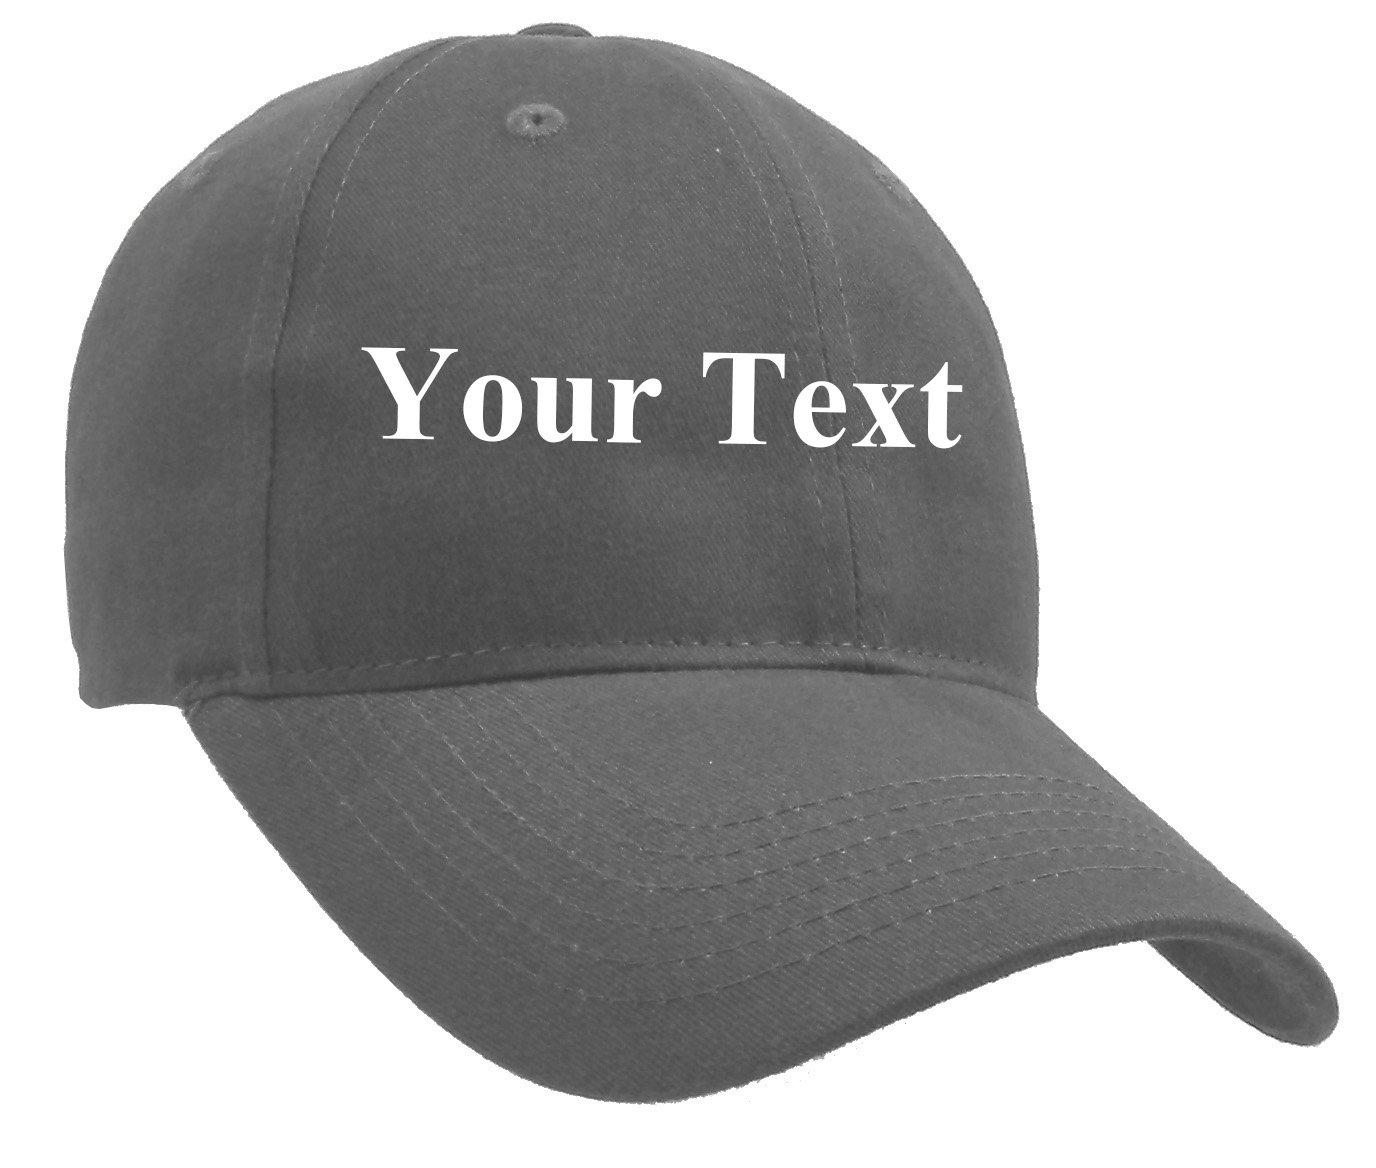 Classic Custom Personalized Adjustable Men's and Women's Cotton Baseball Cap